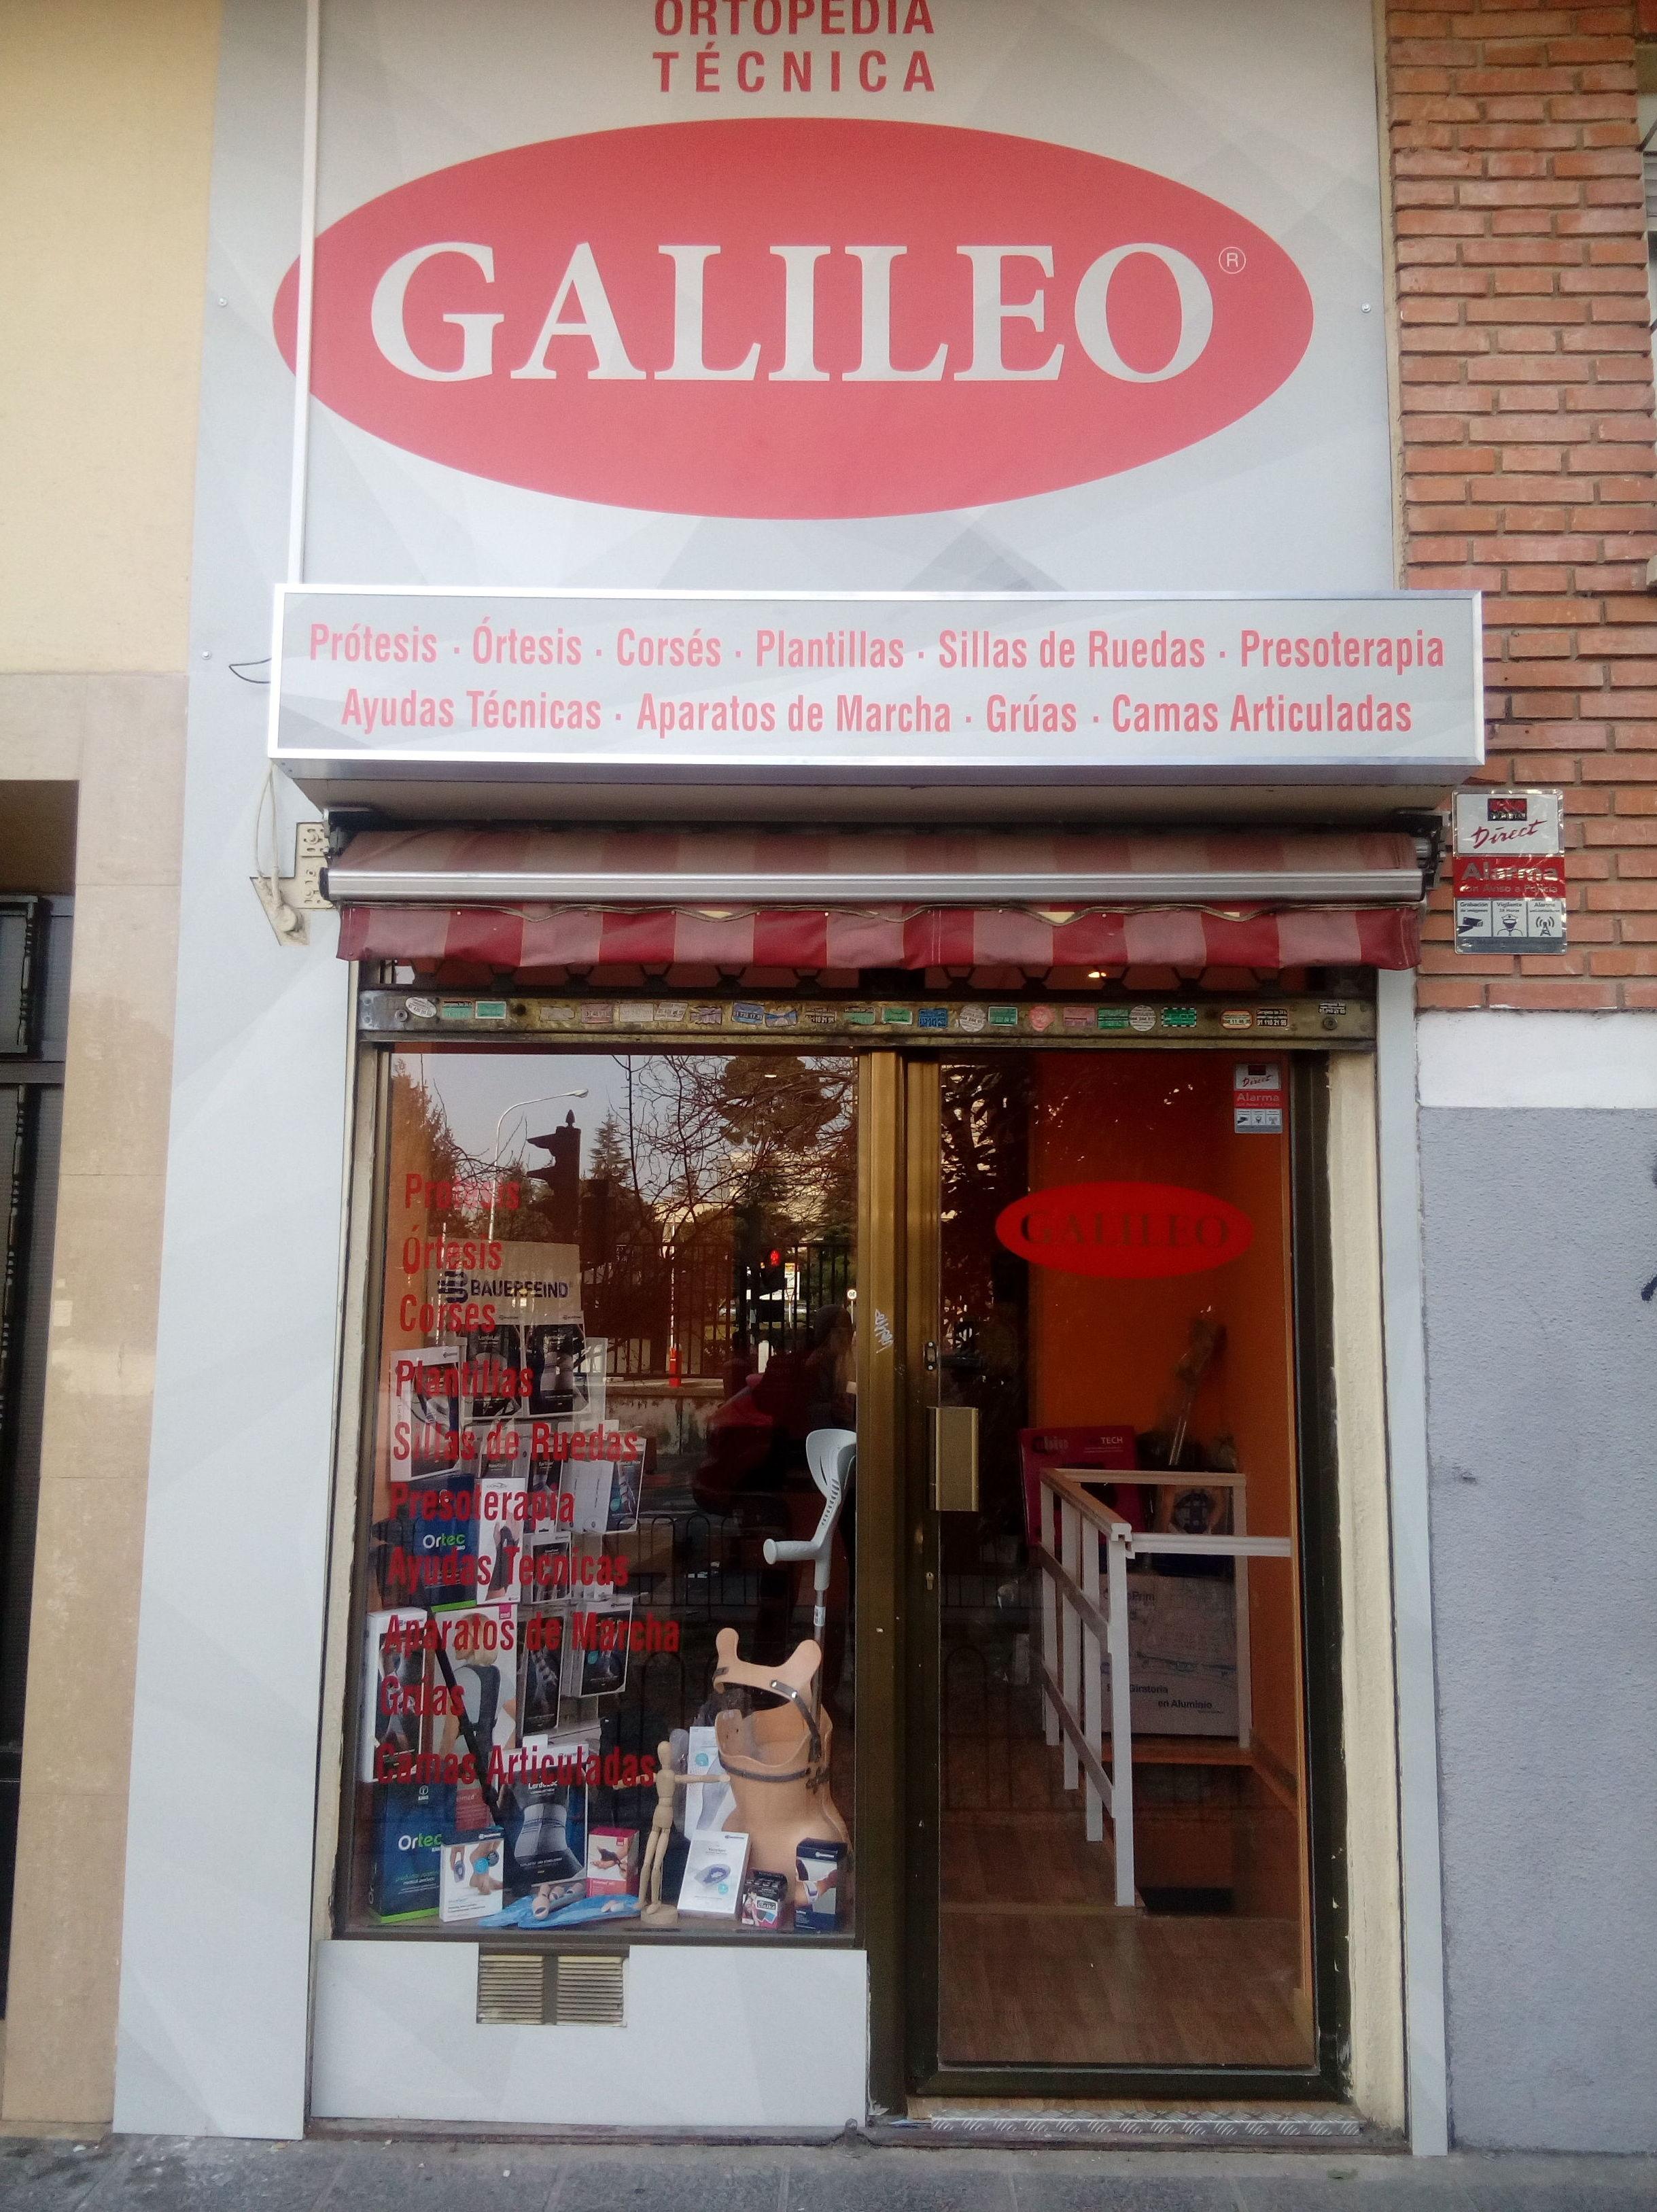 Ortopedia Técnica Galileo sucrsal de Carabanchel